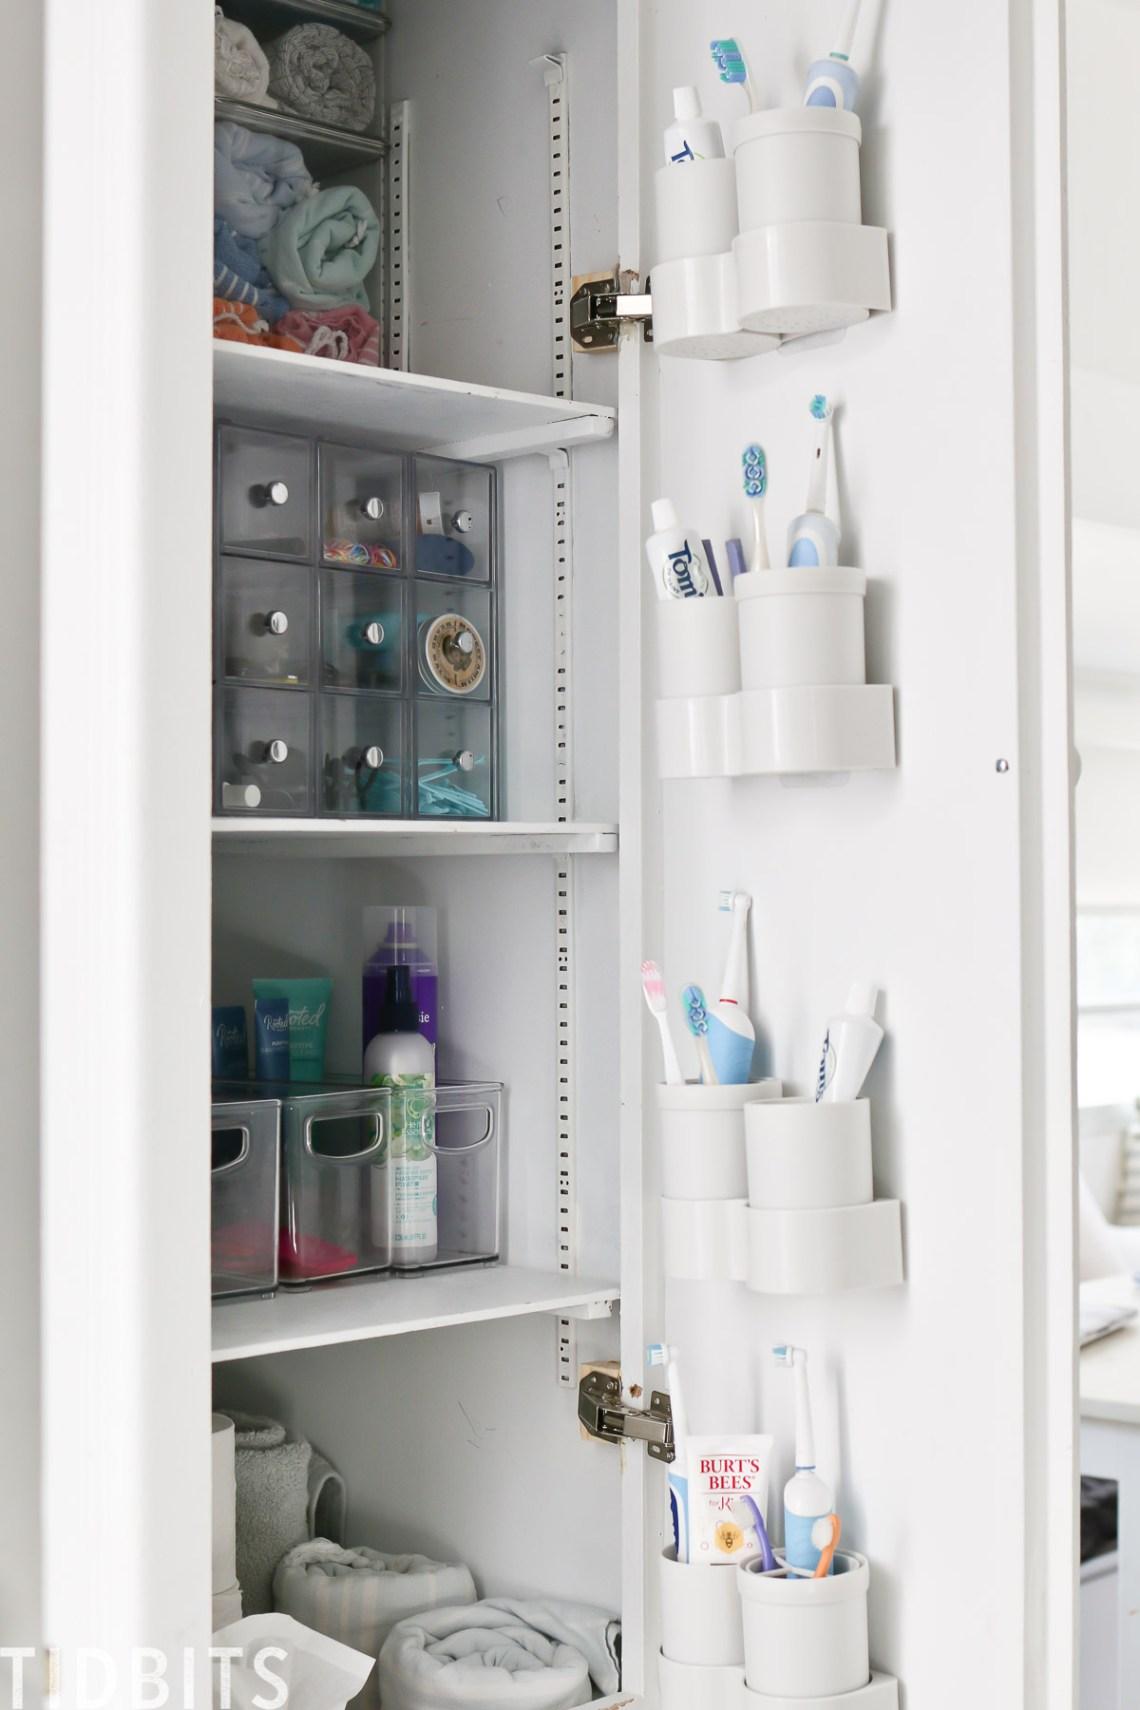 Toothbrush Organization In Rv Bathroom